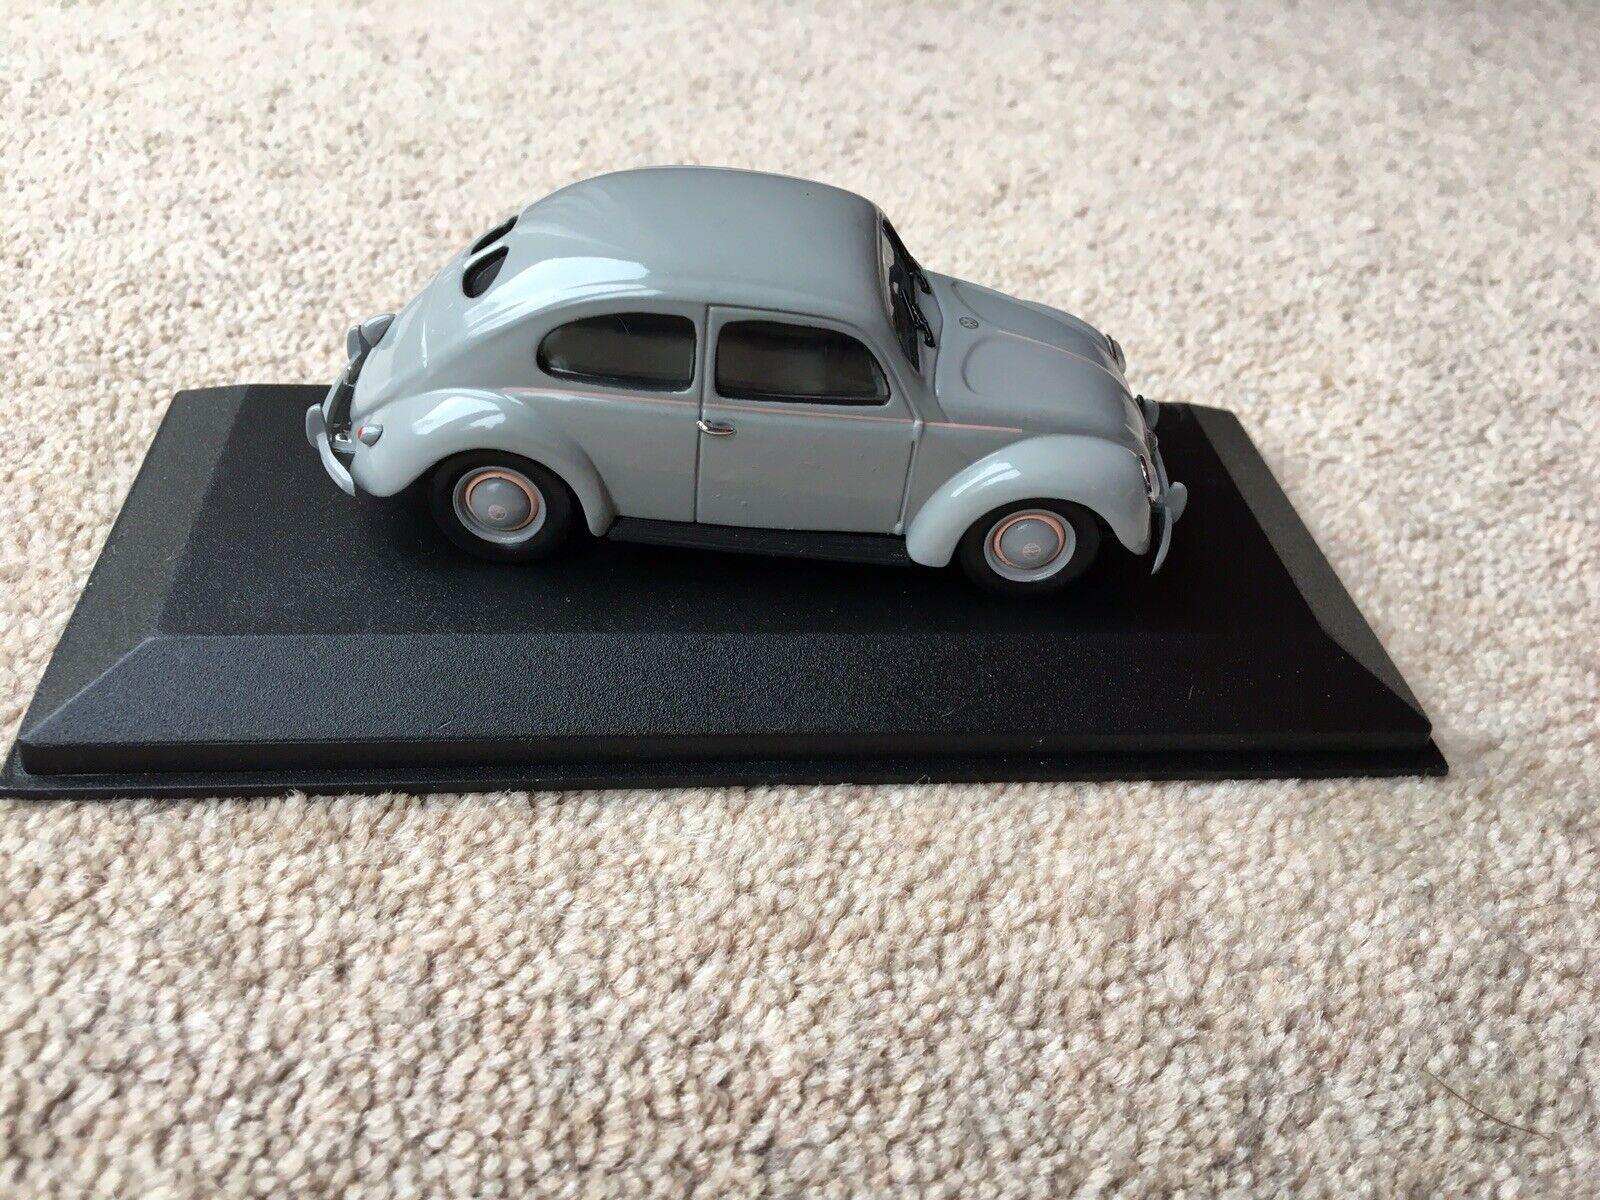 MINICHAMPS VW KAFER BEETLE PAULS MODEL ART No 430 052001 SPLIT WINDOW BOXED NEW